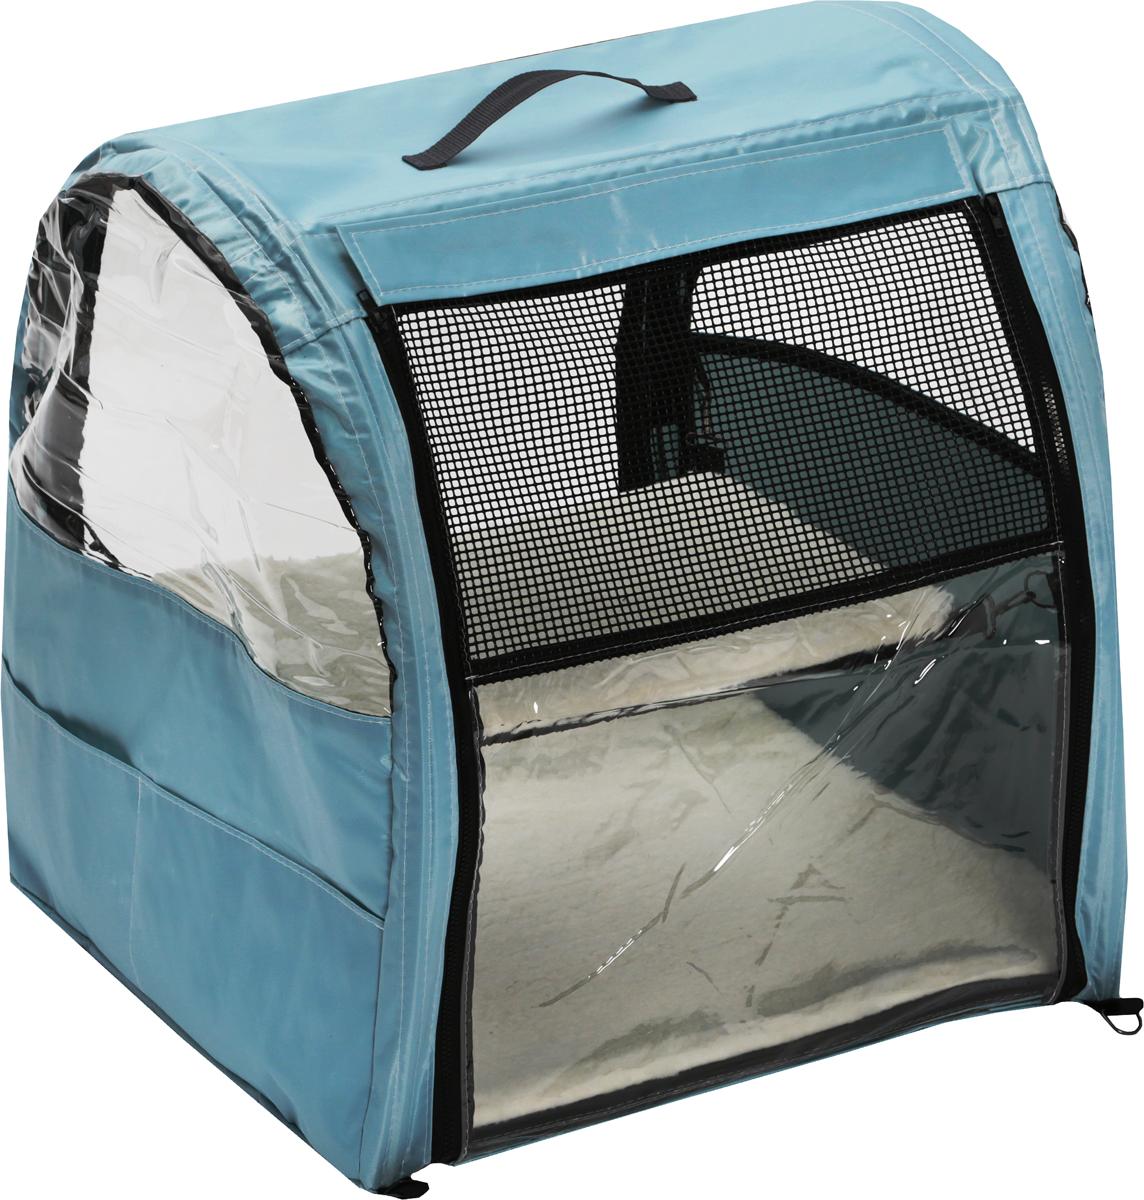 Клетка-палатка для животных Заря-Плюс, выставочная, с чехлом, цвет: нежно-голубой, 51 х 58 х 55 см палатки greenell палатка дом 2